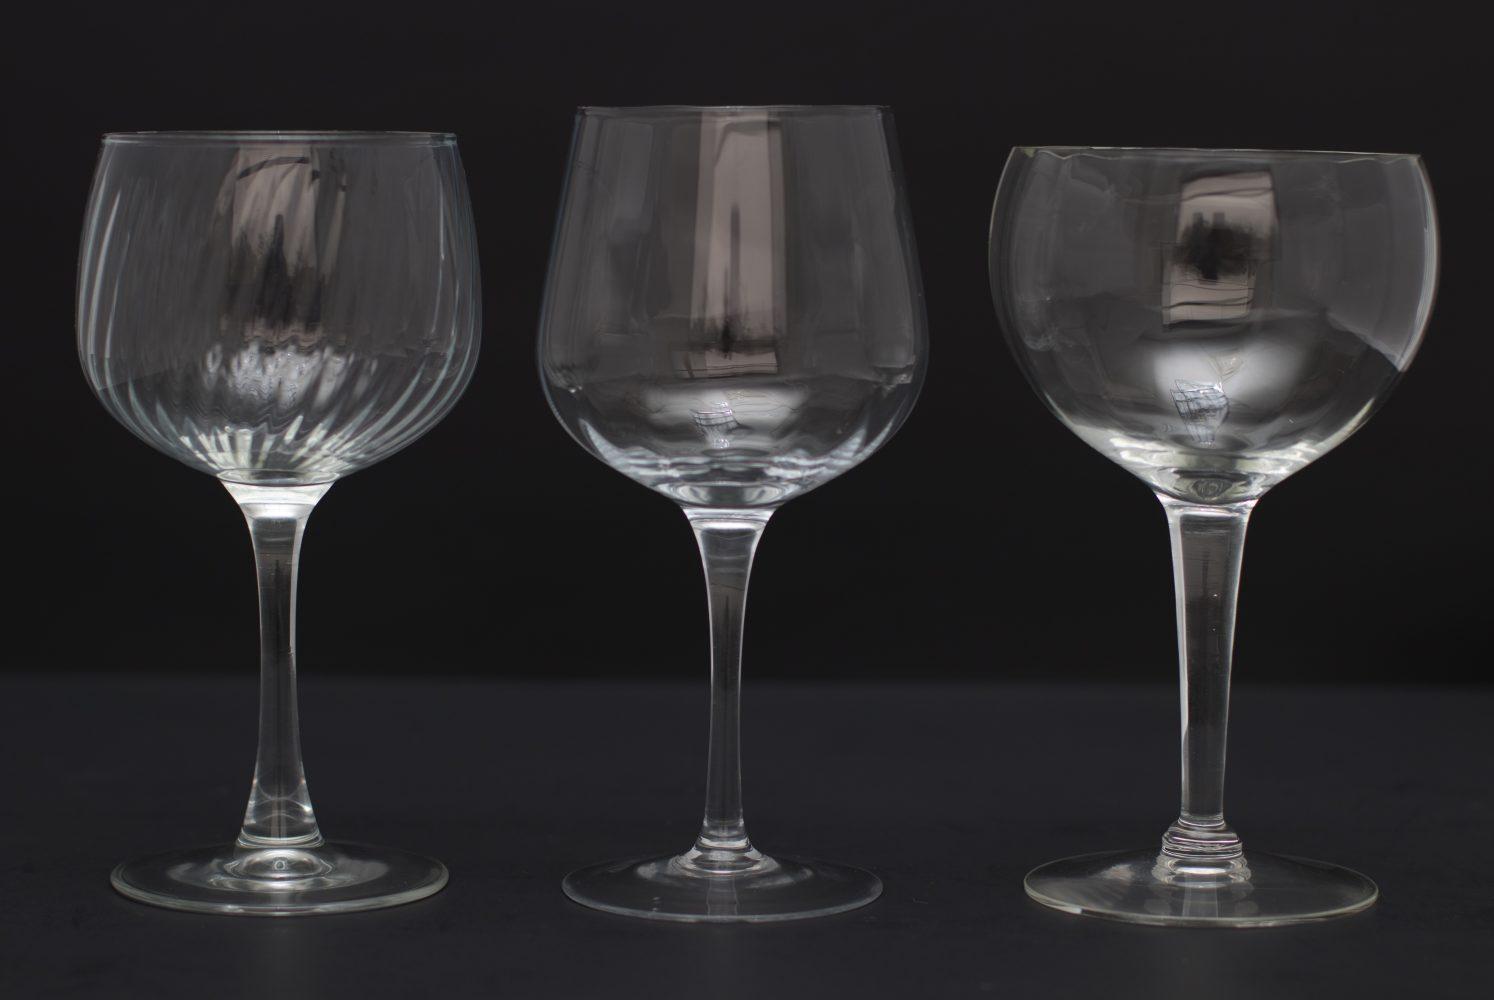 Medium Stem Red Wine Collection Image